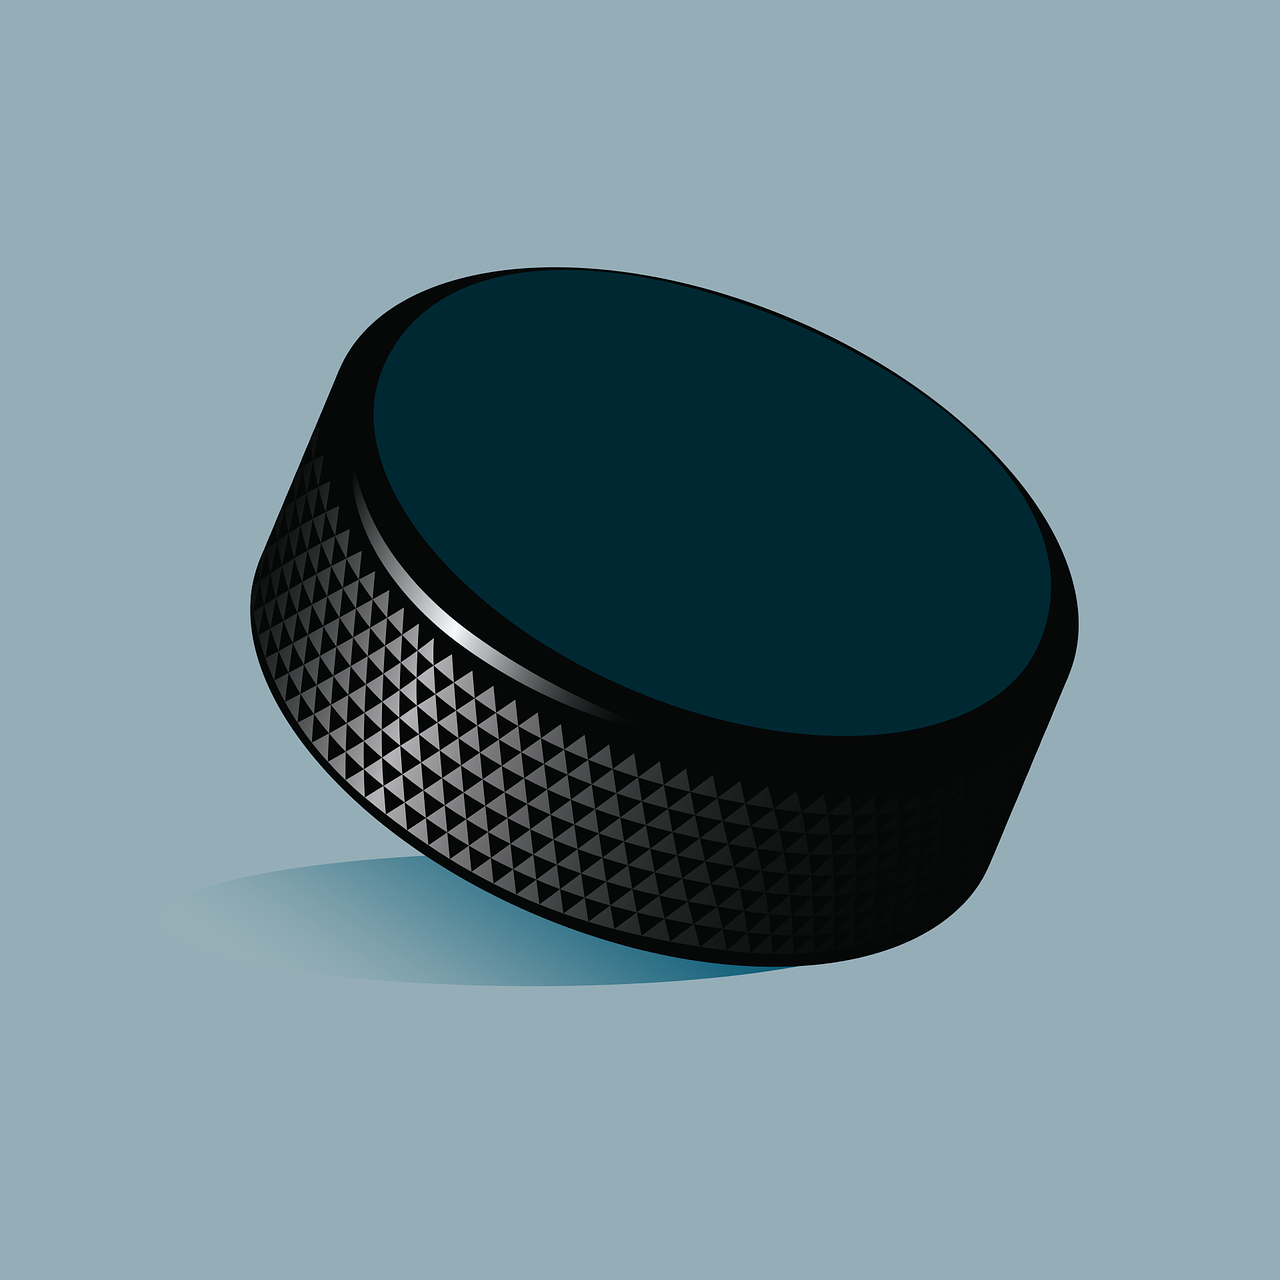 Hockey puck 1477440 1280